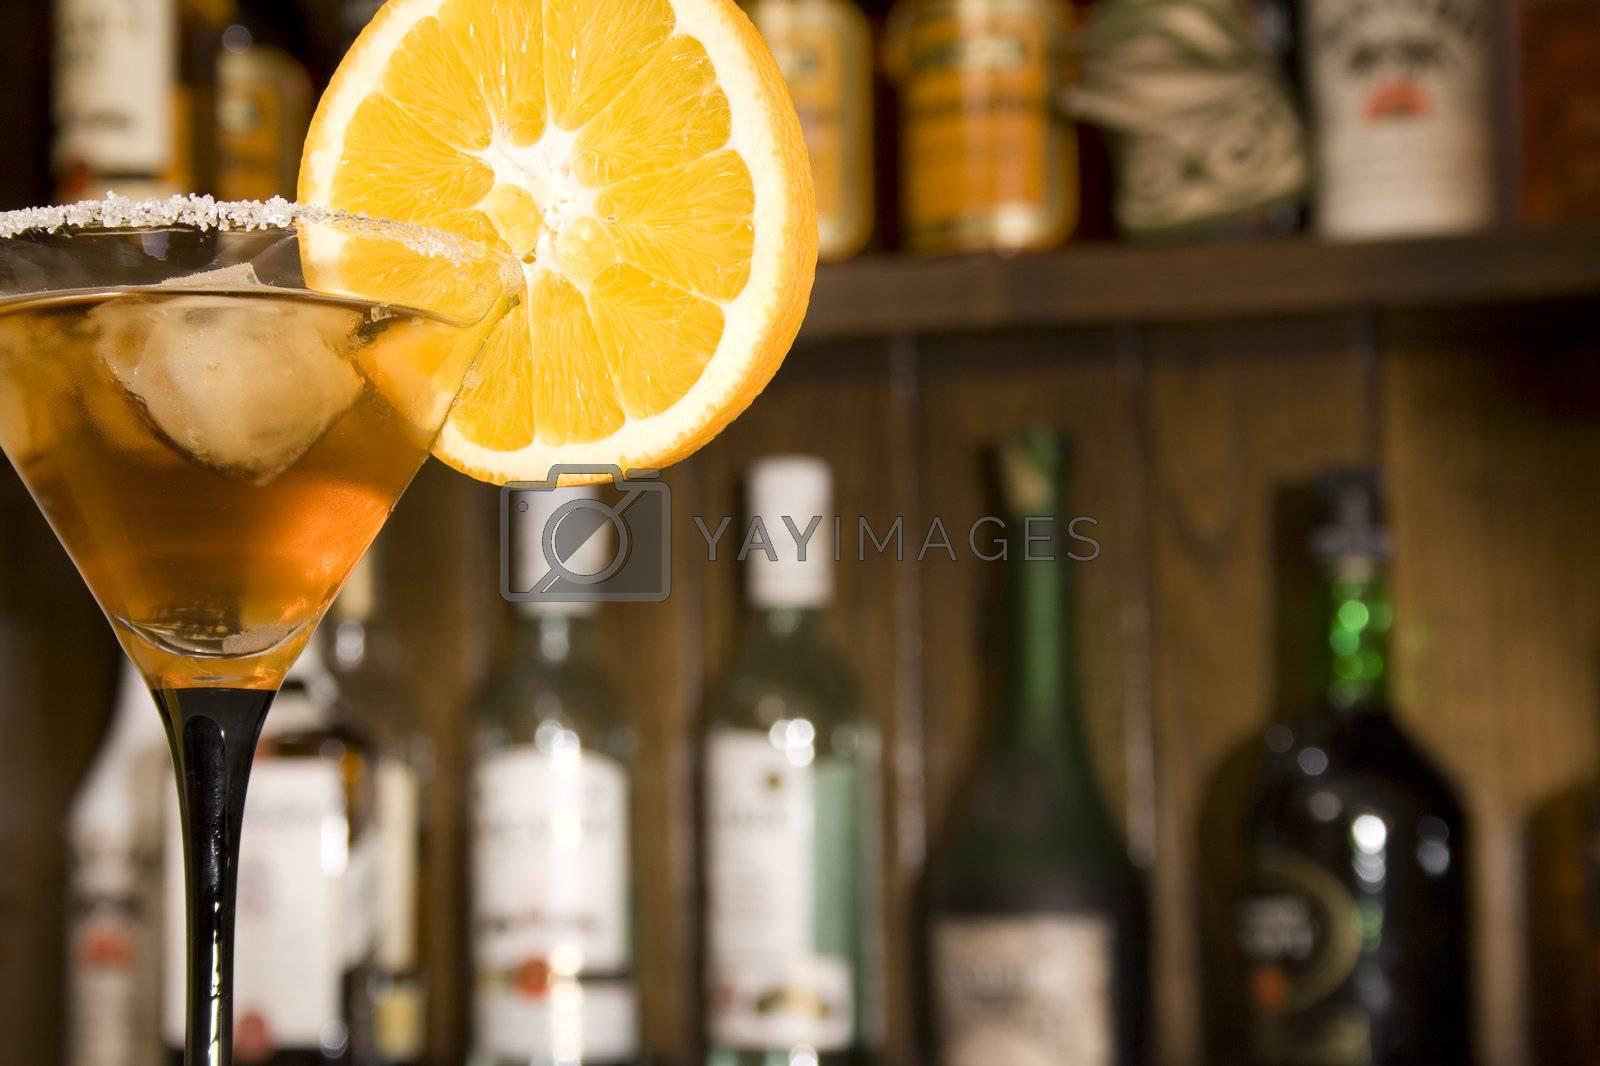 Lemon Cocktail by PauloResende